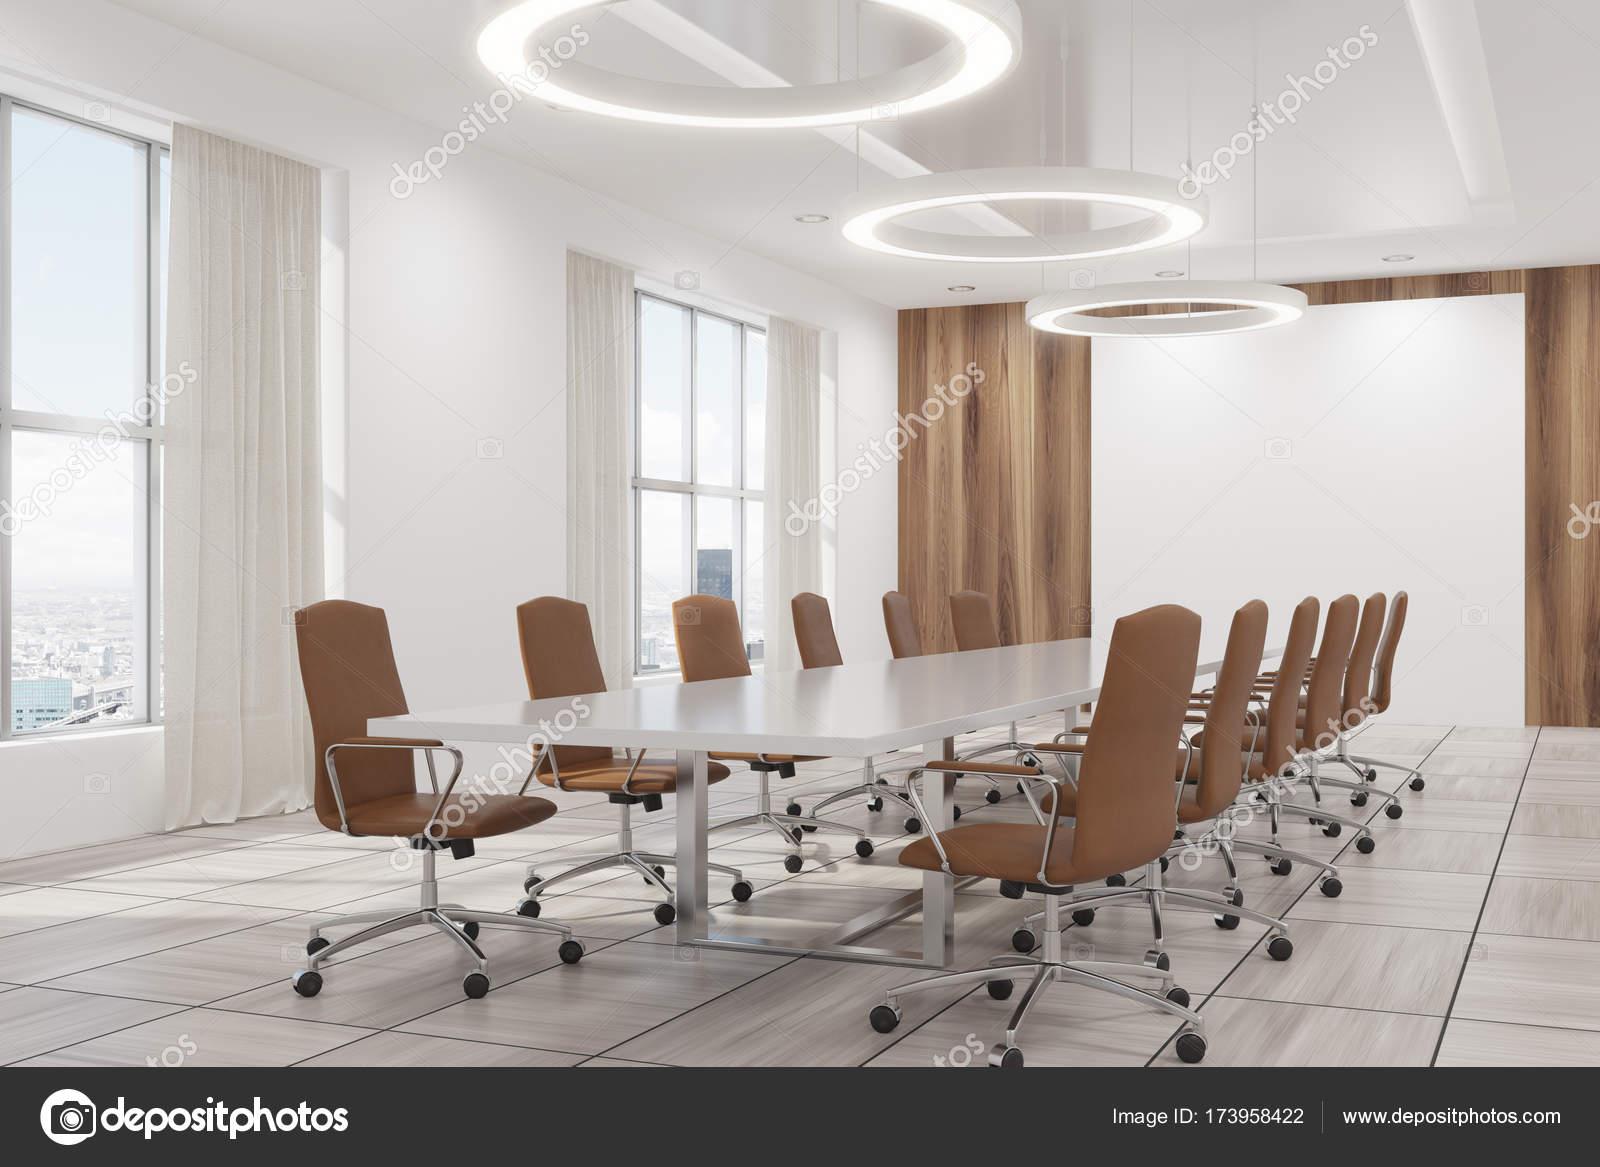 https://st3.depositphotos.com/2673929/17395/i/1600/depositphotos_173958422-stockafbeelding-witte-conferentie-kamer-interieur-bruin.jpg